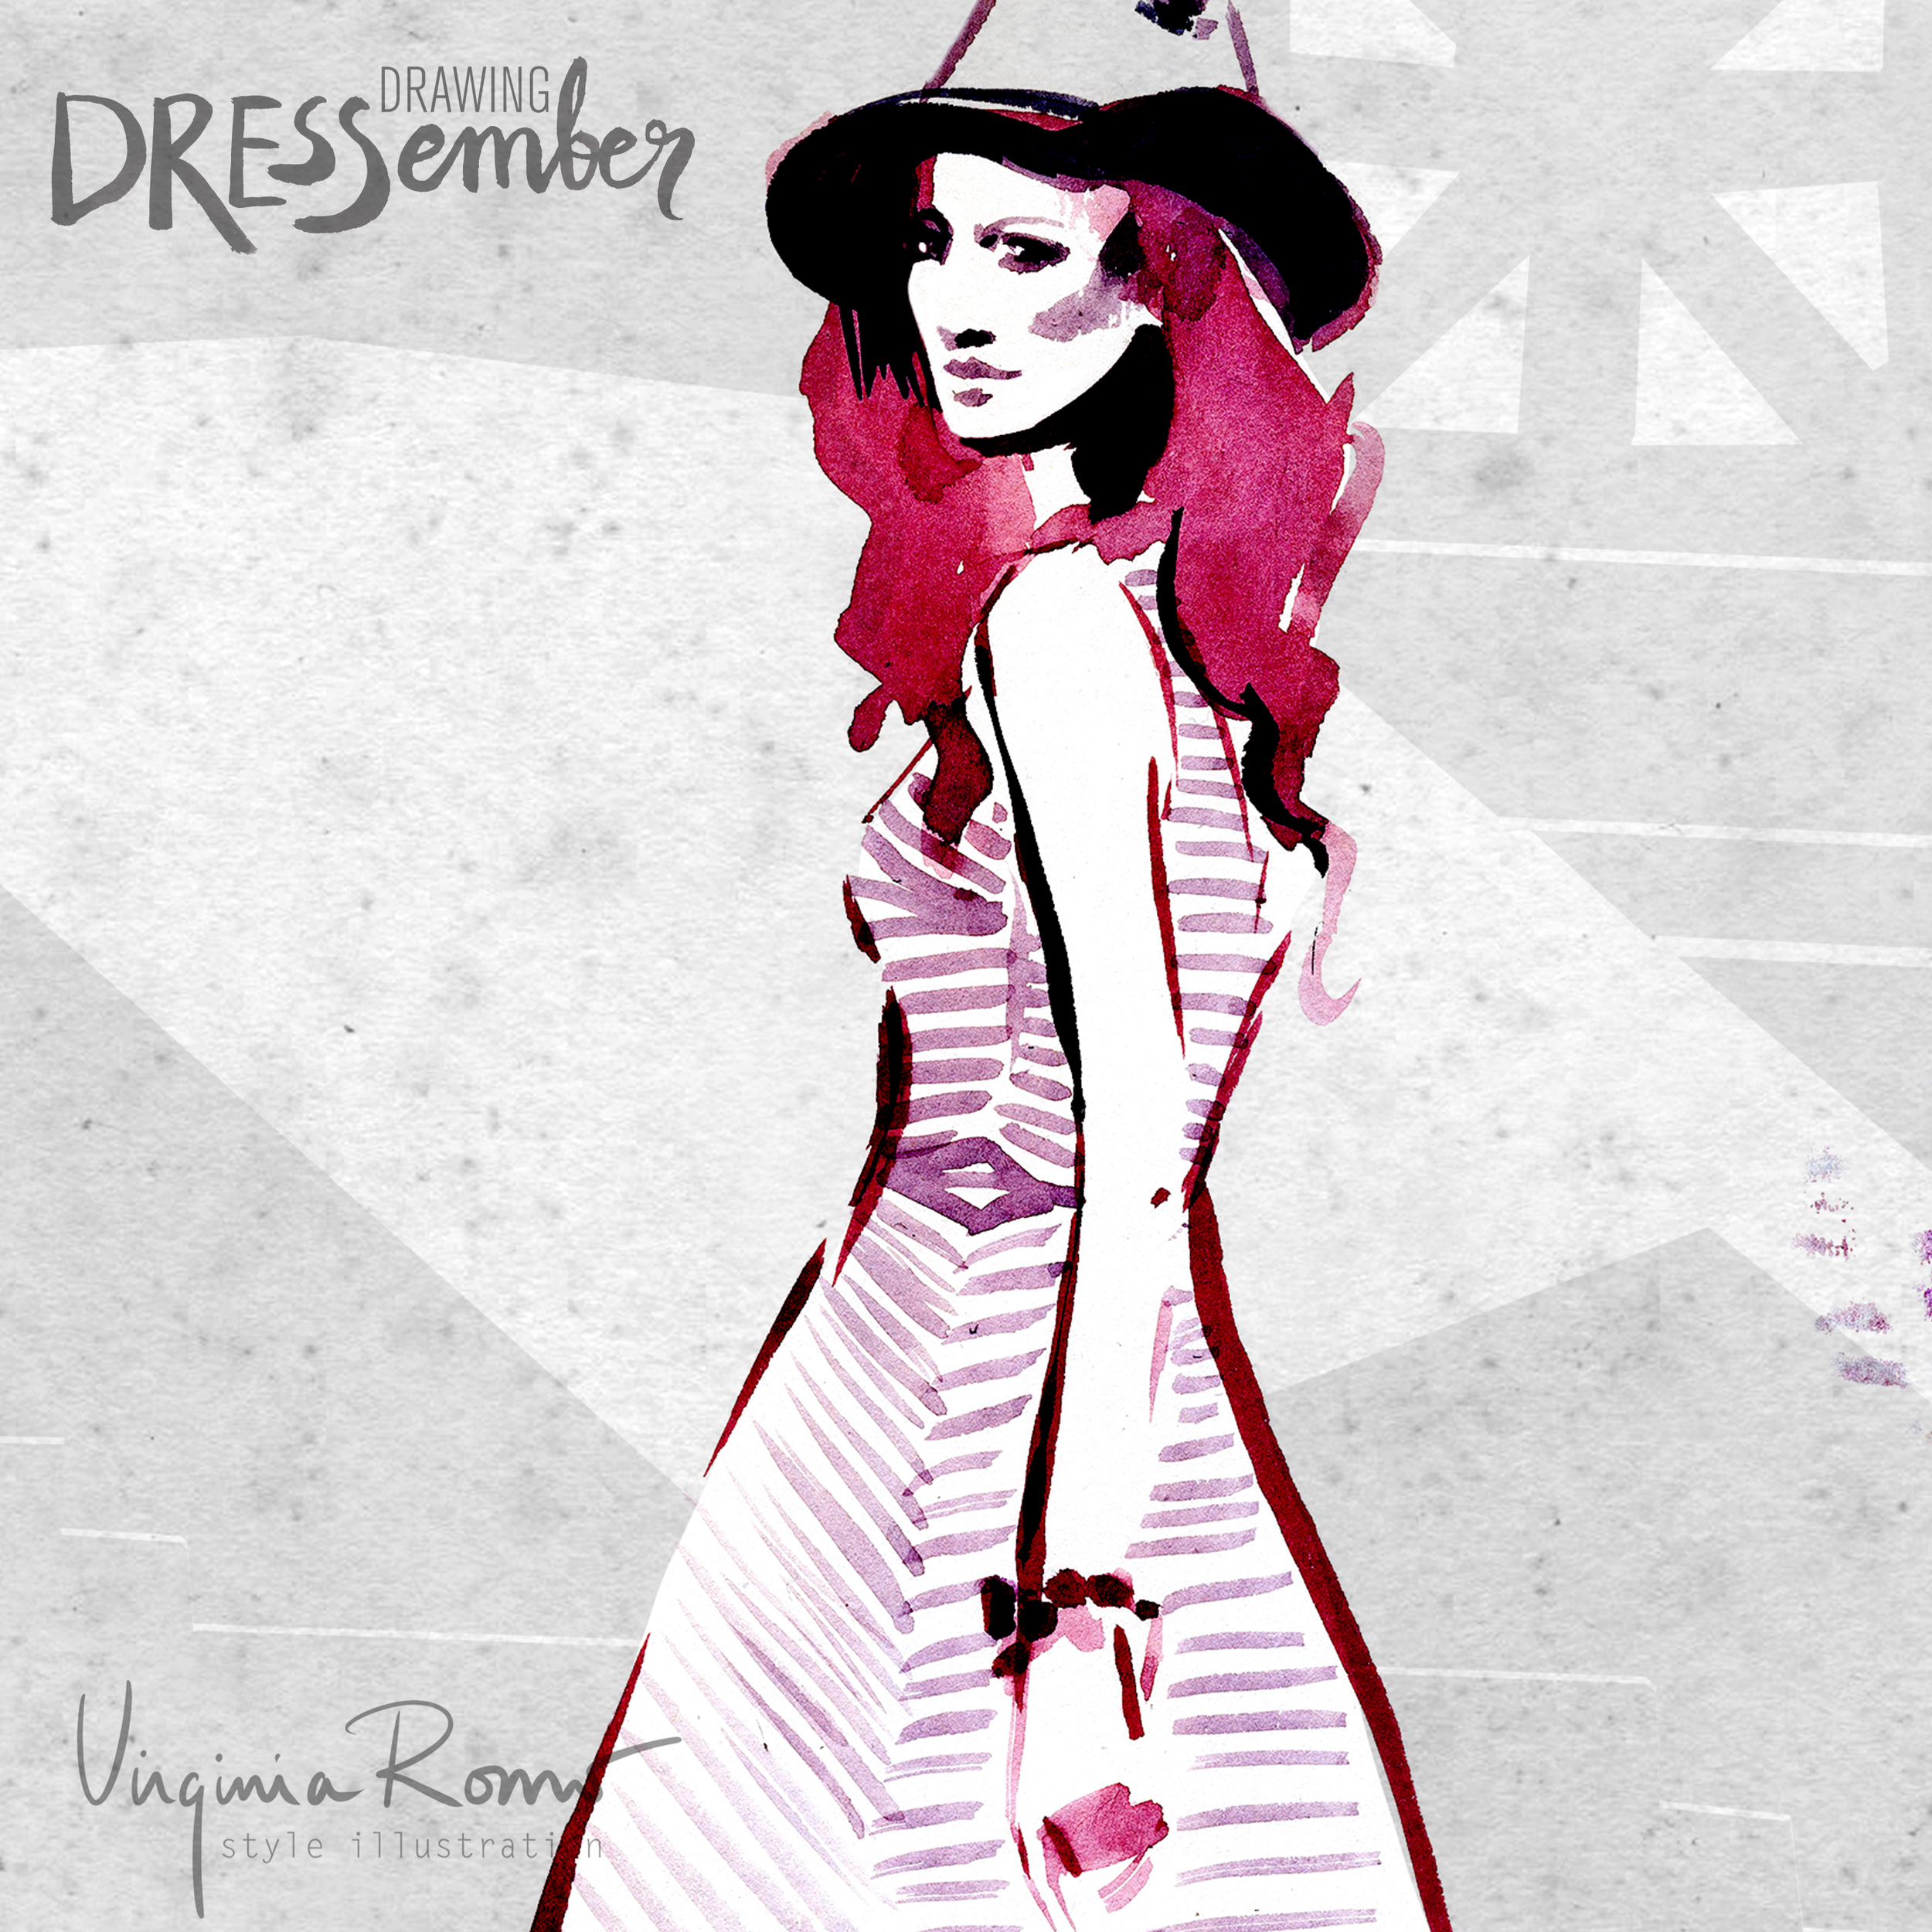 dressember-VirginiaRomoIllustration-21-ElizabethCool-IG-BIG.jpg